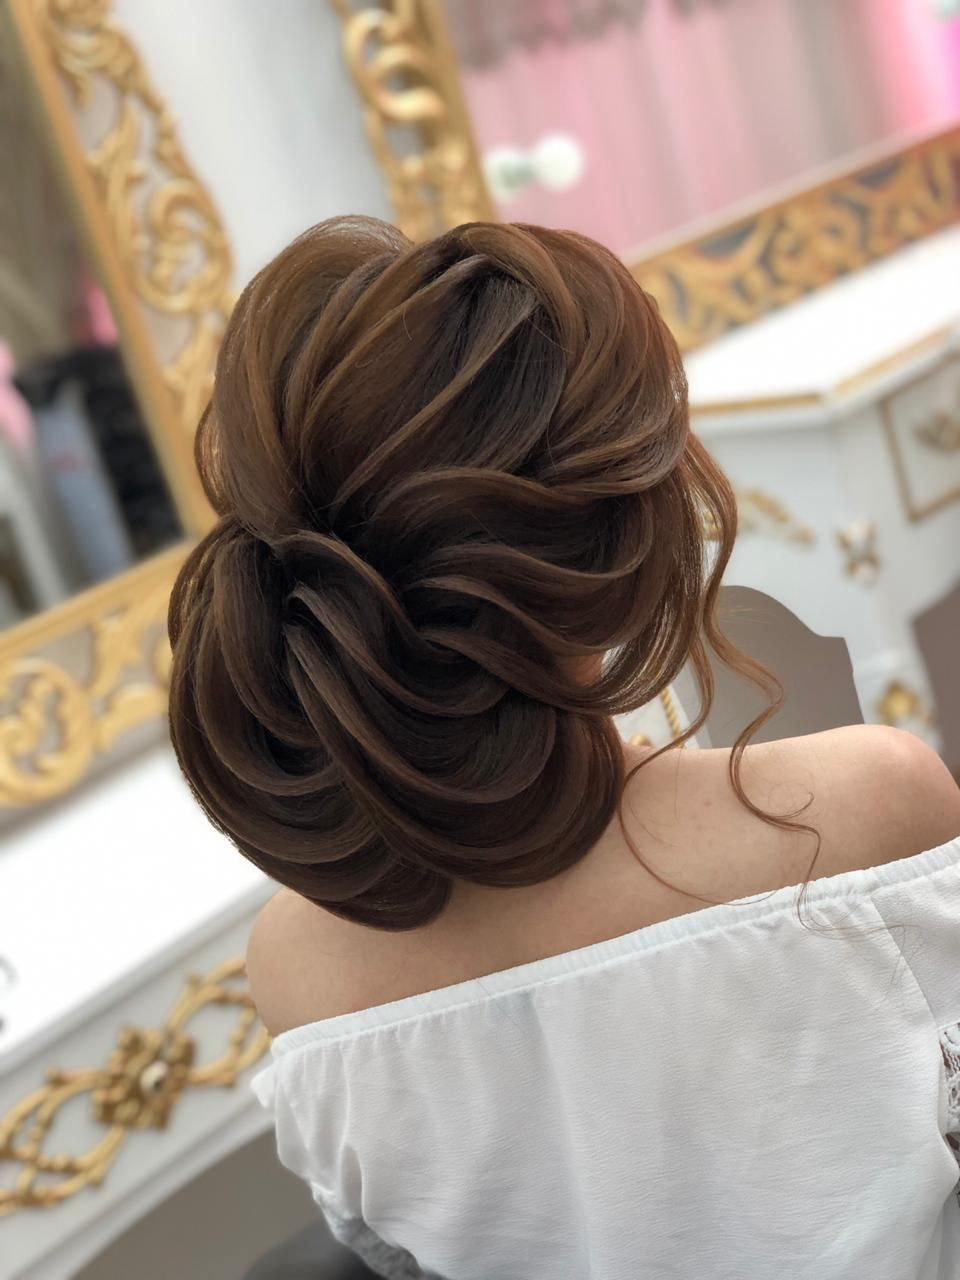 Pin By Orxideya Beauty Studio On Wedding Make Up Hair Styles Hair Care Wedding Photoshoot